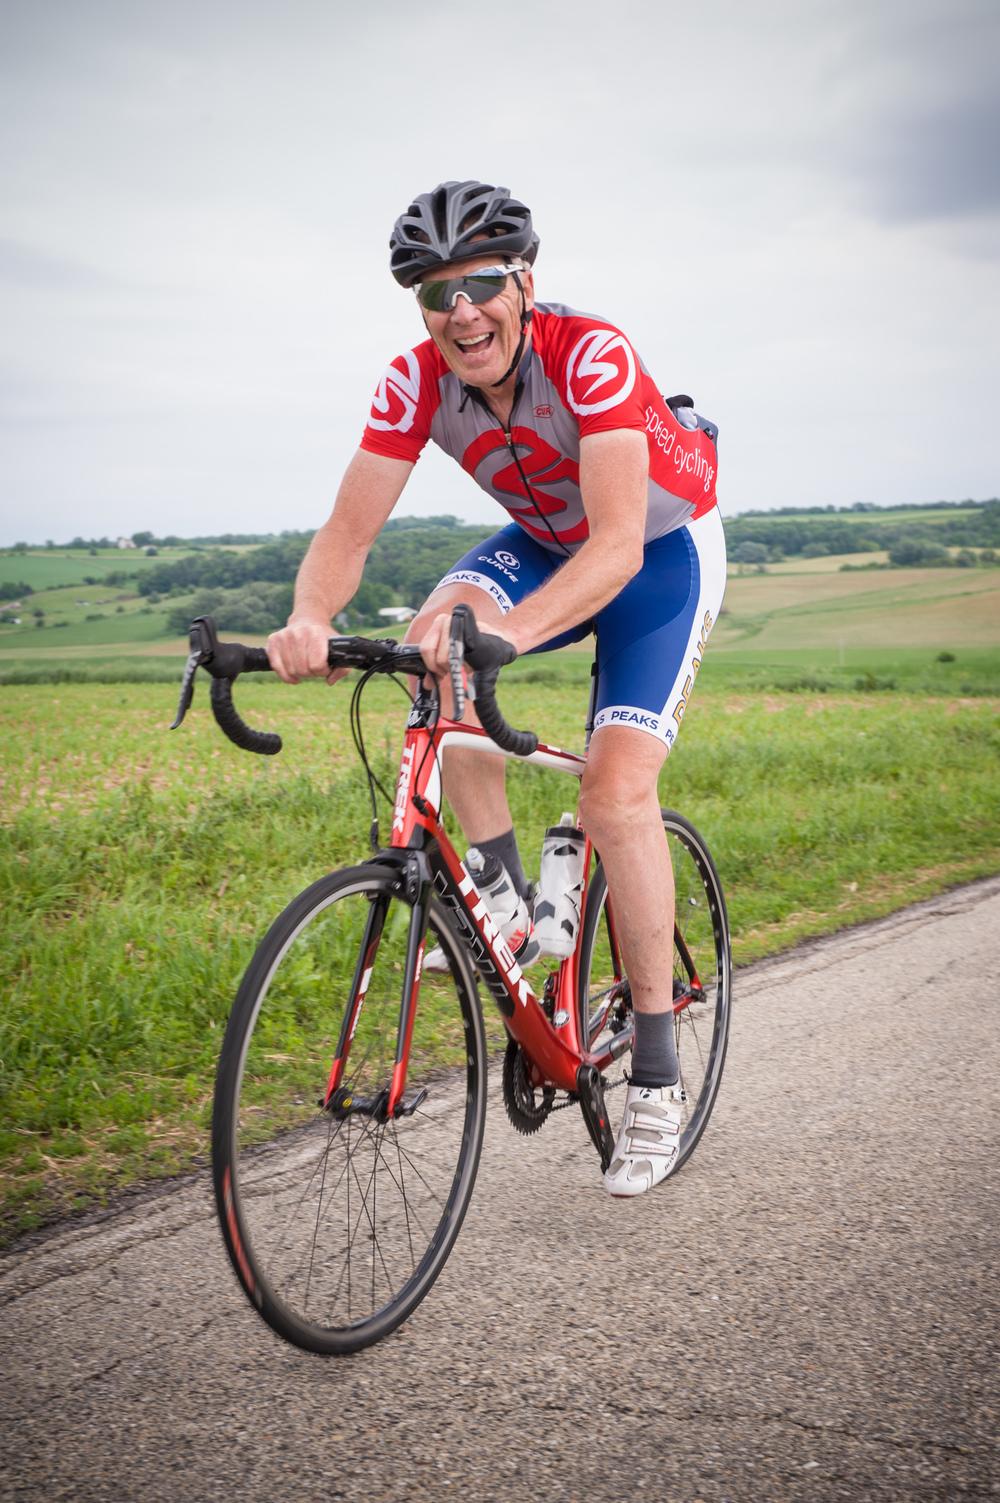 20140615_SpeedCycling_-148.jpg